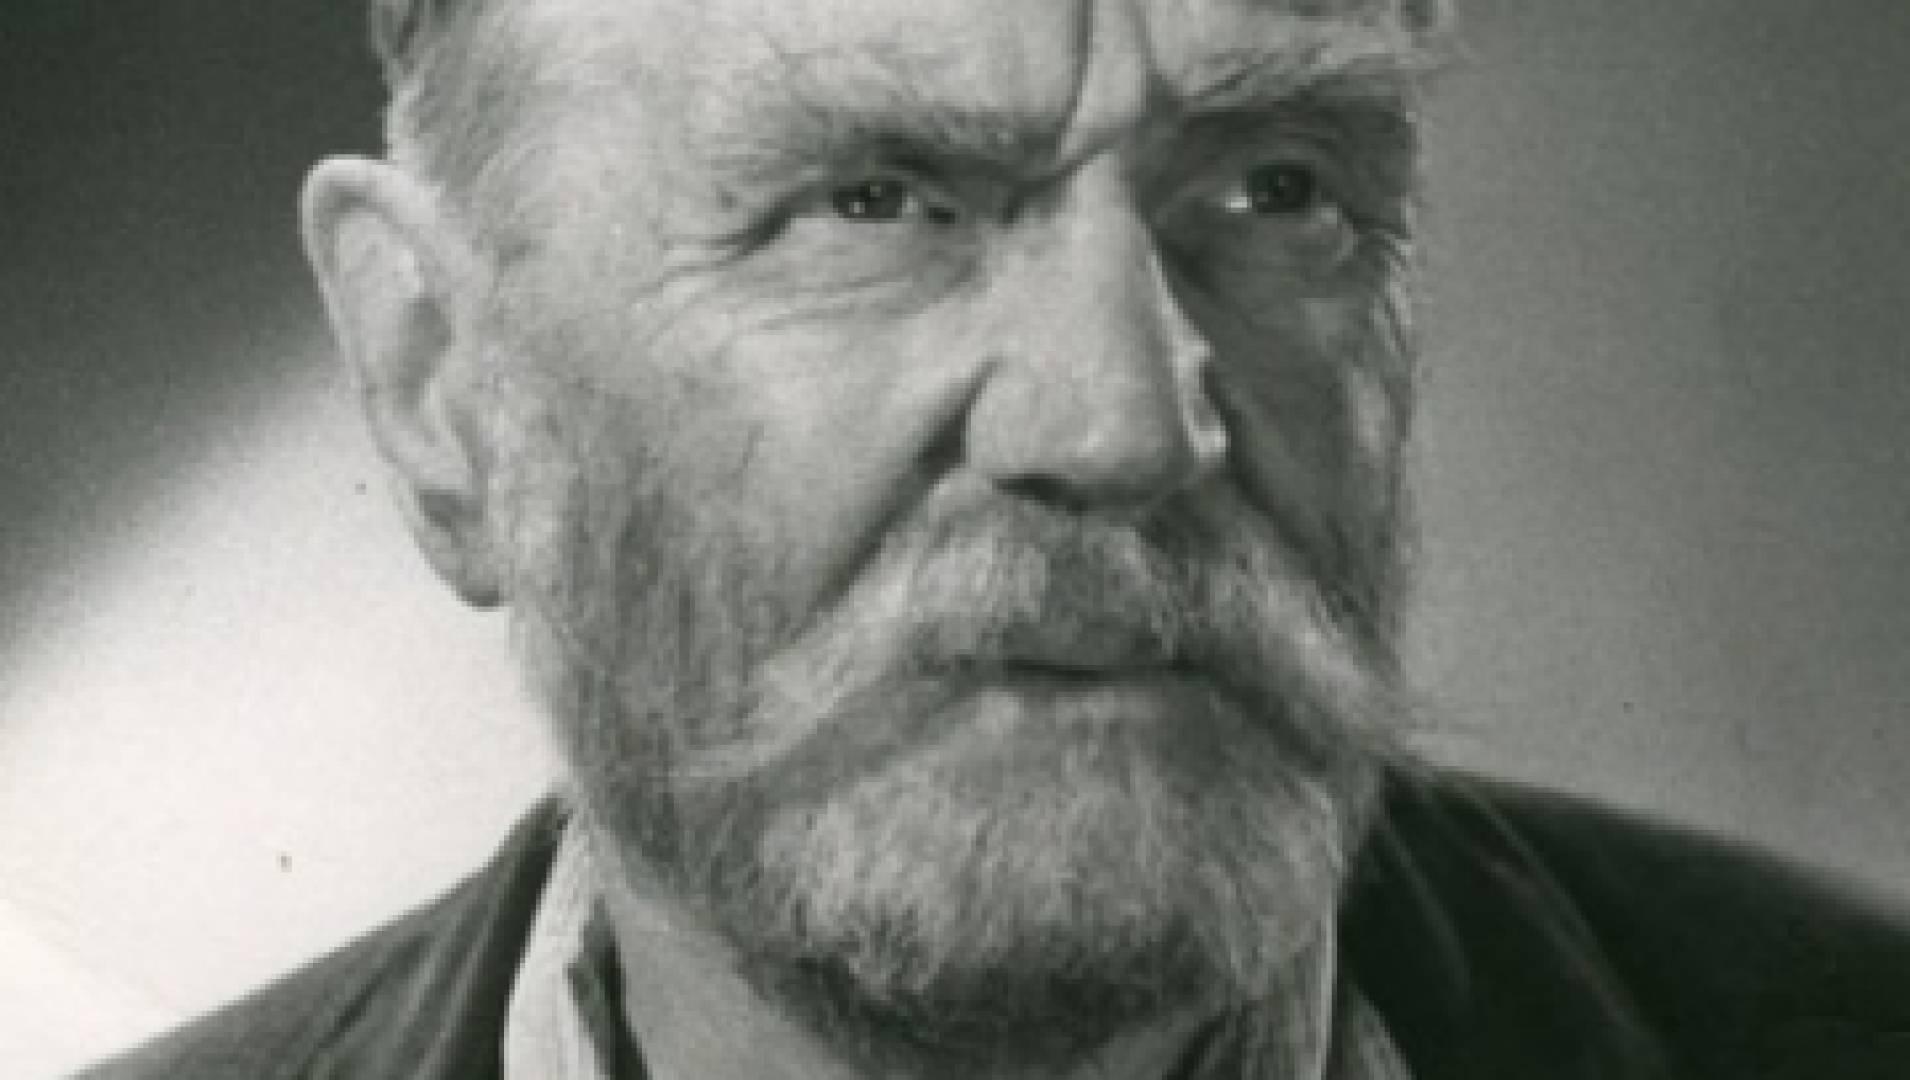 Поэма оморе - Кинороман, Фильм